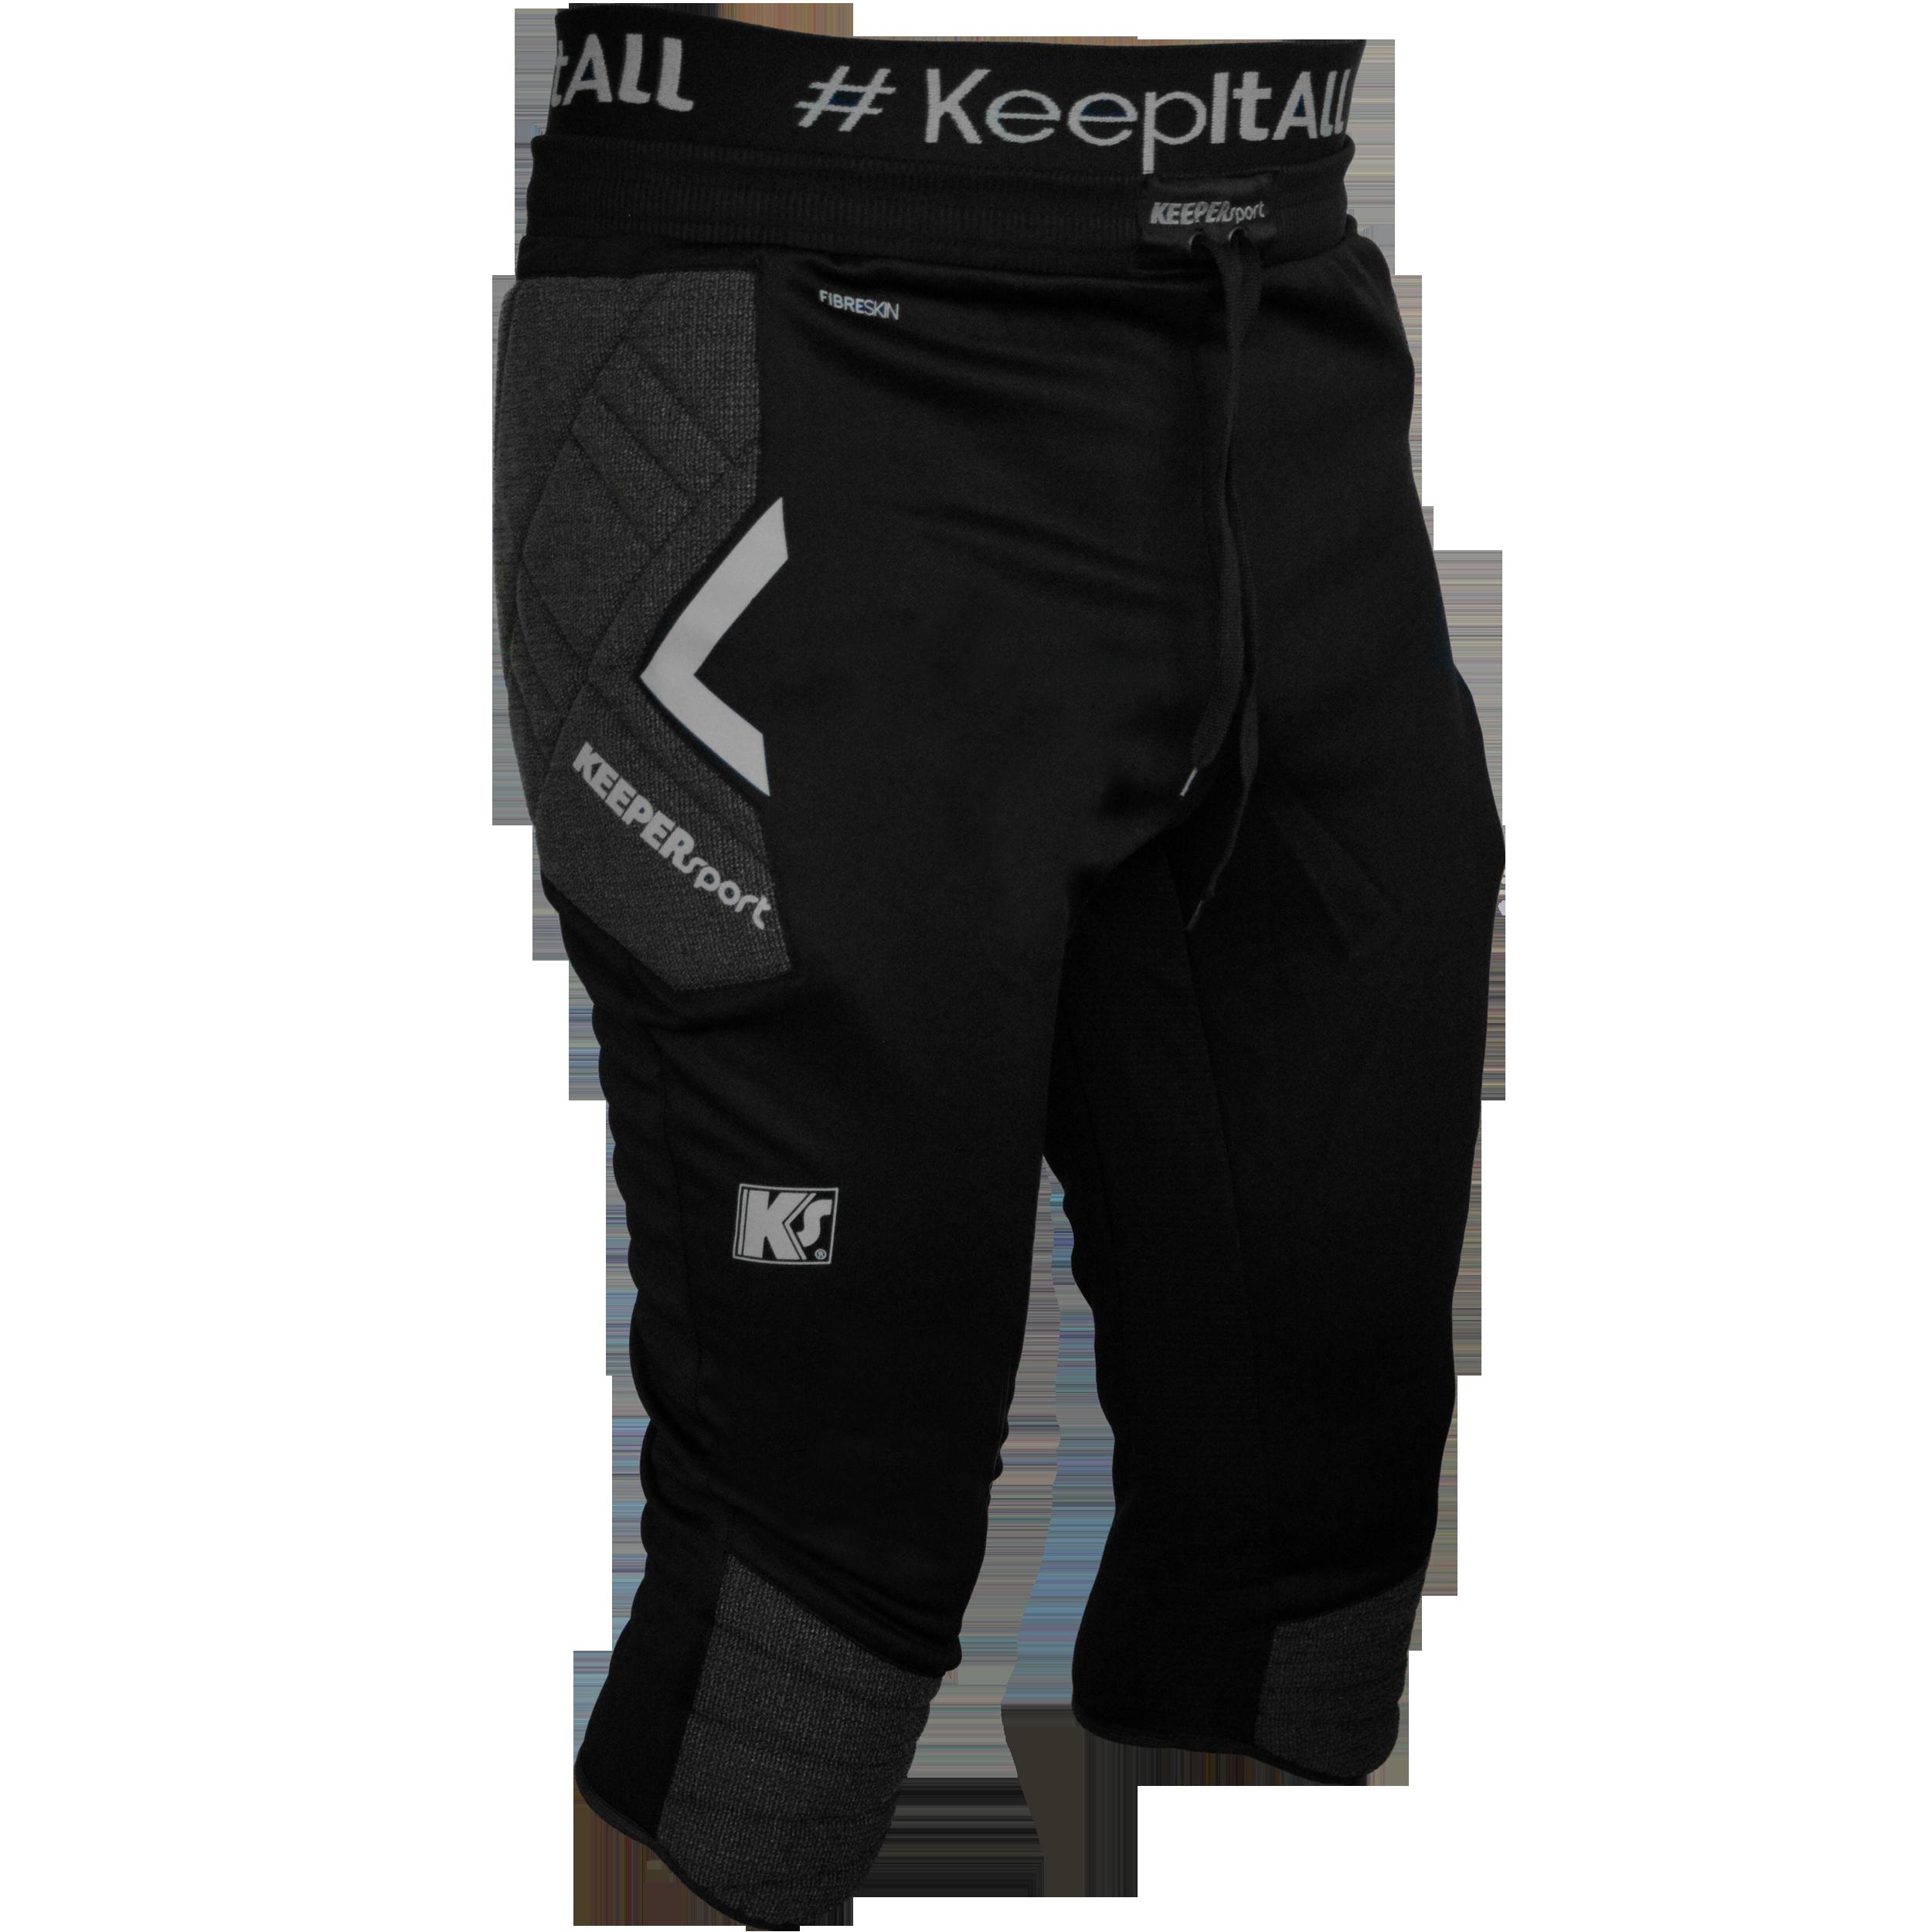 KEEPERsport Training 3/4 GK-Pants RP